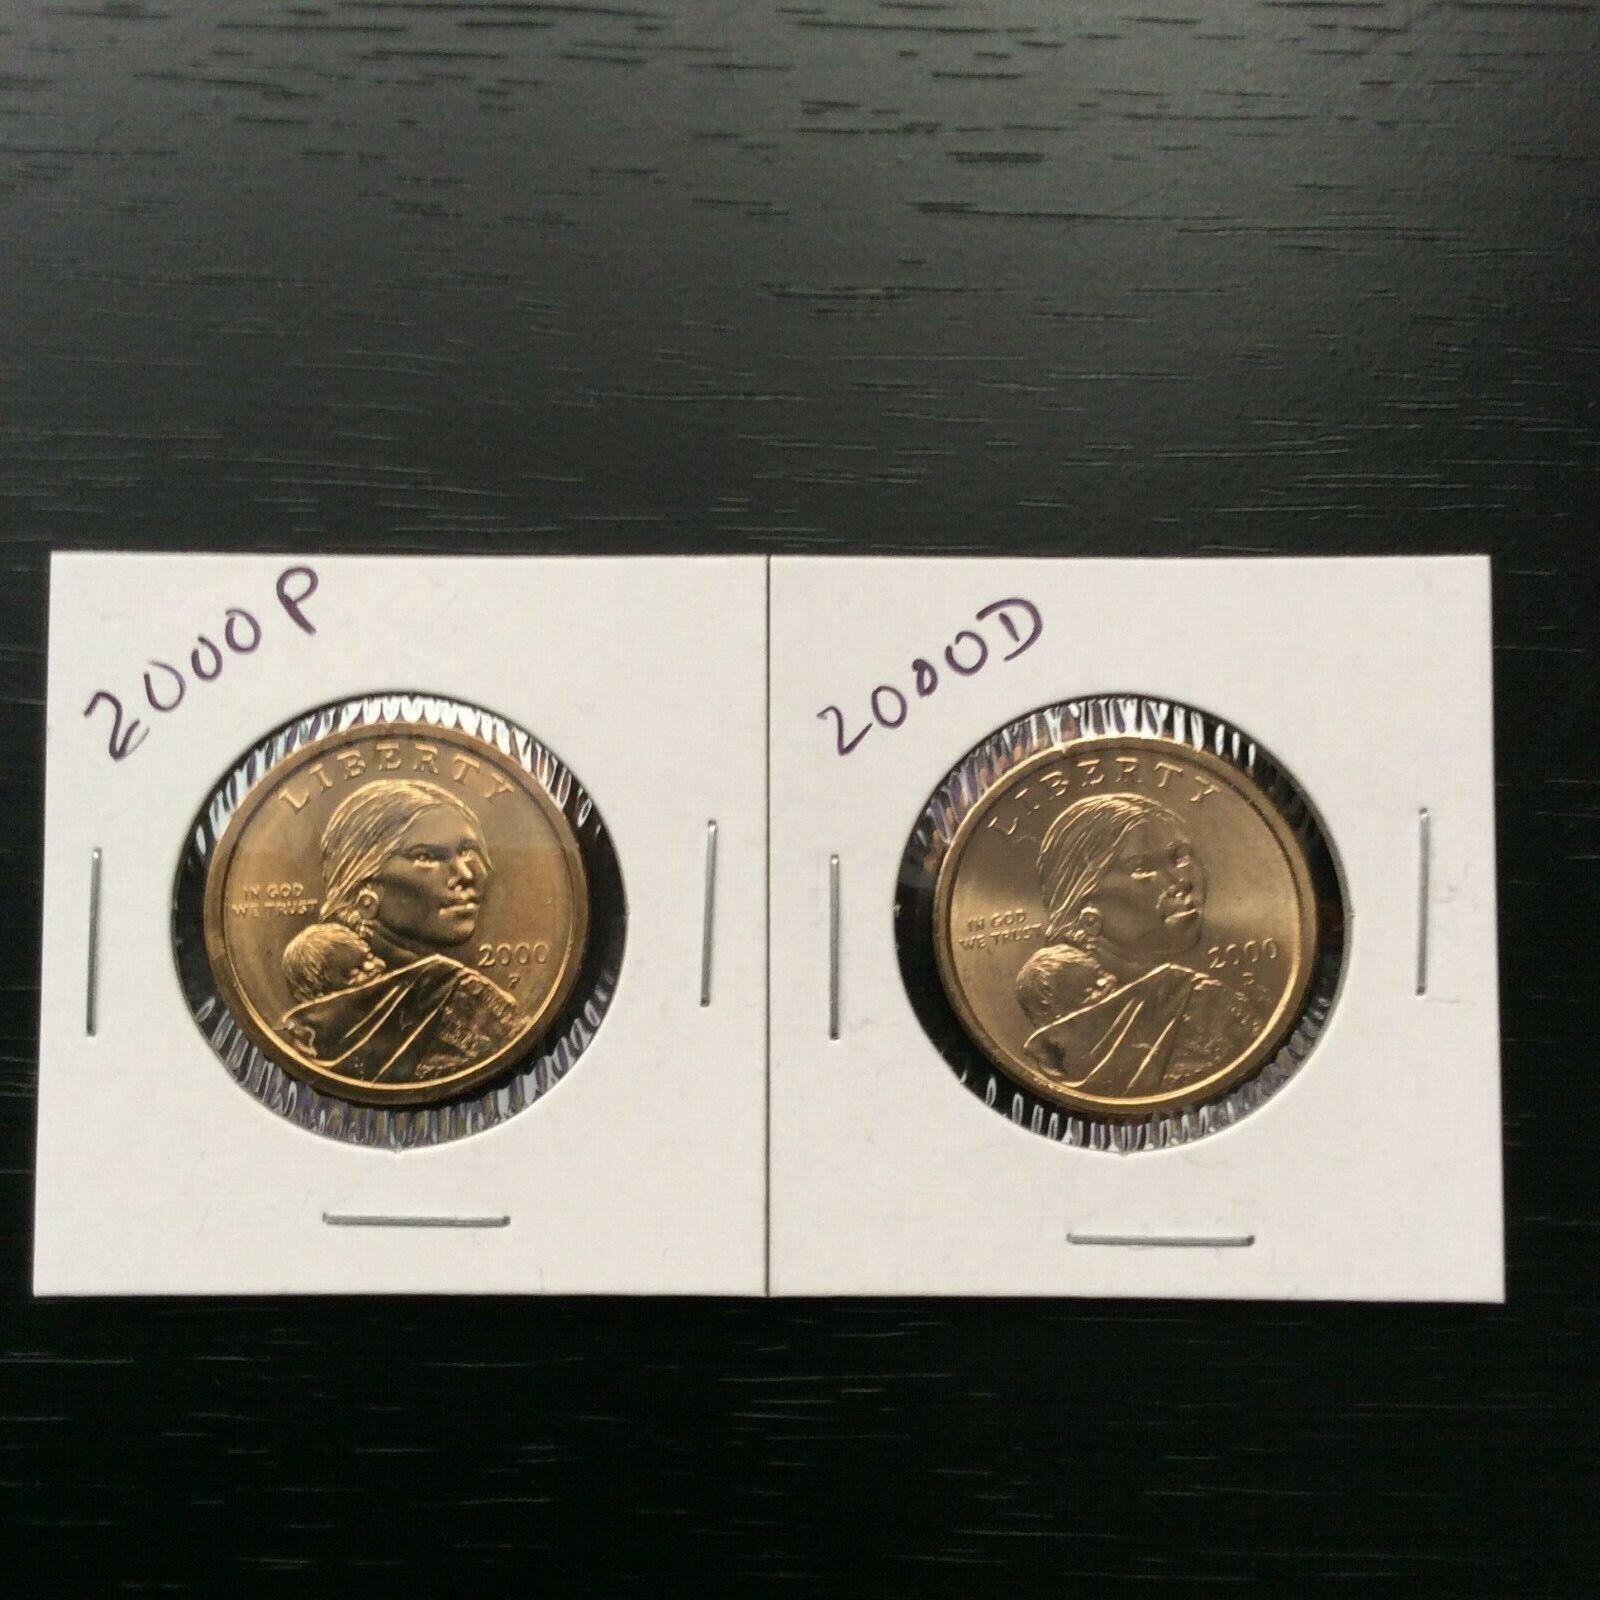 2000 Sac Sacagawea Dollars P&D from US Mint Rolls